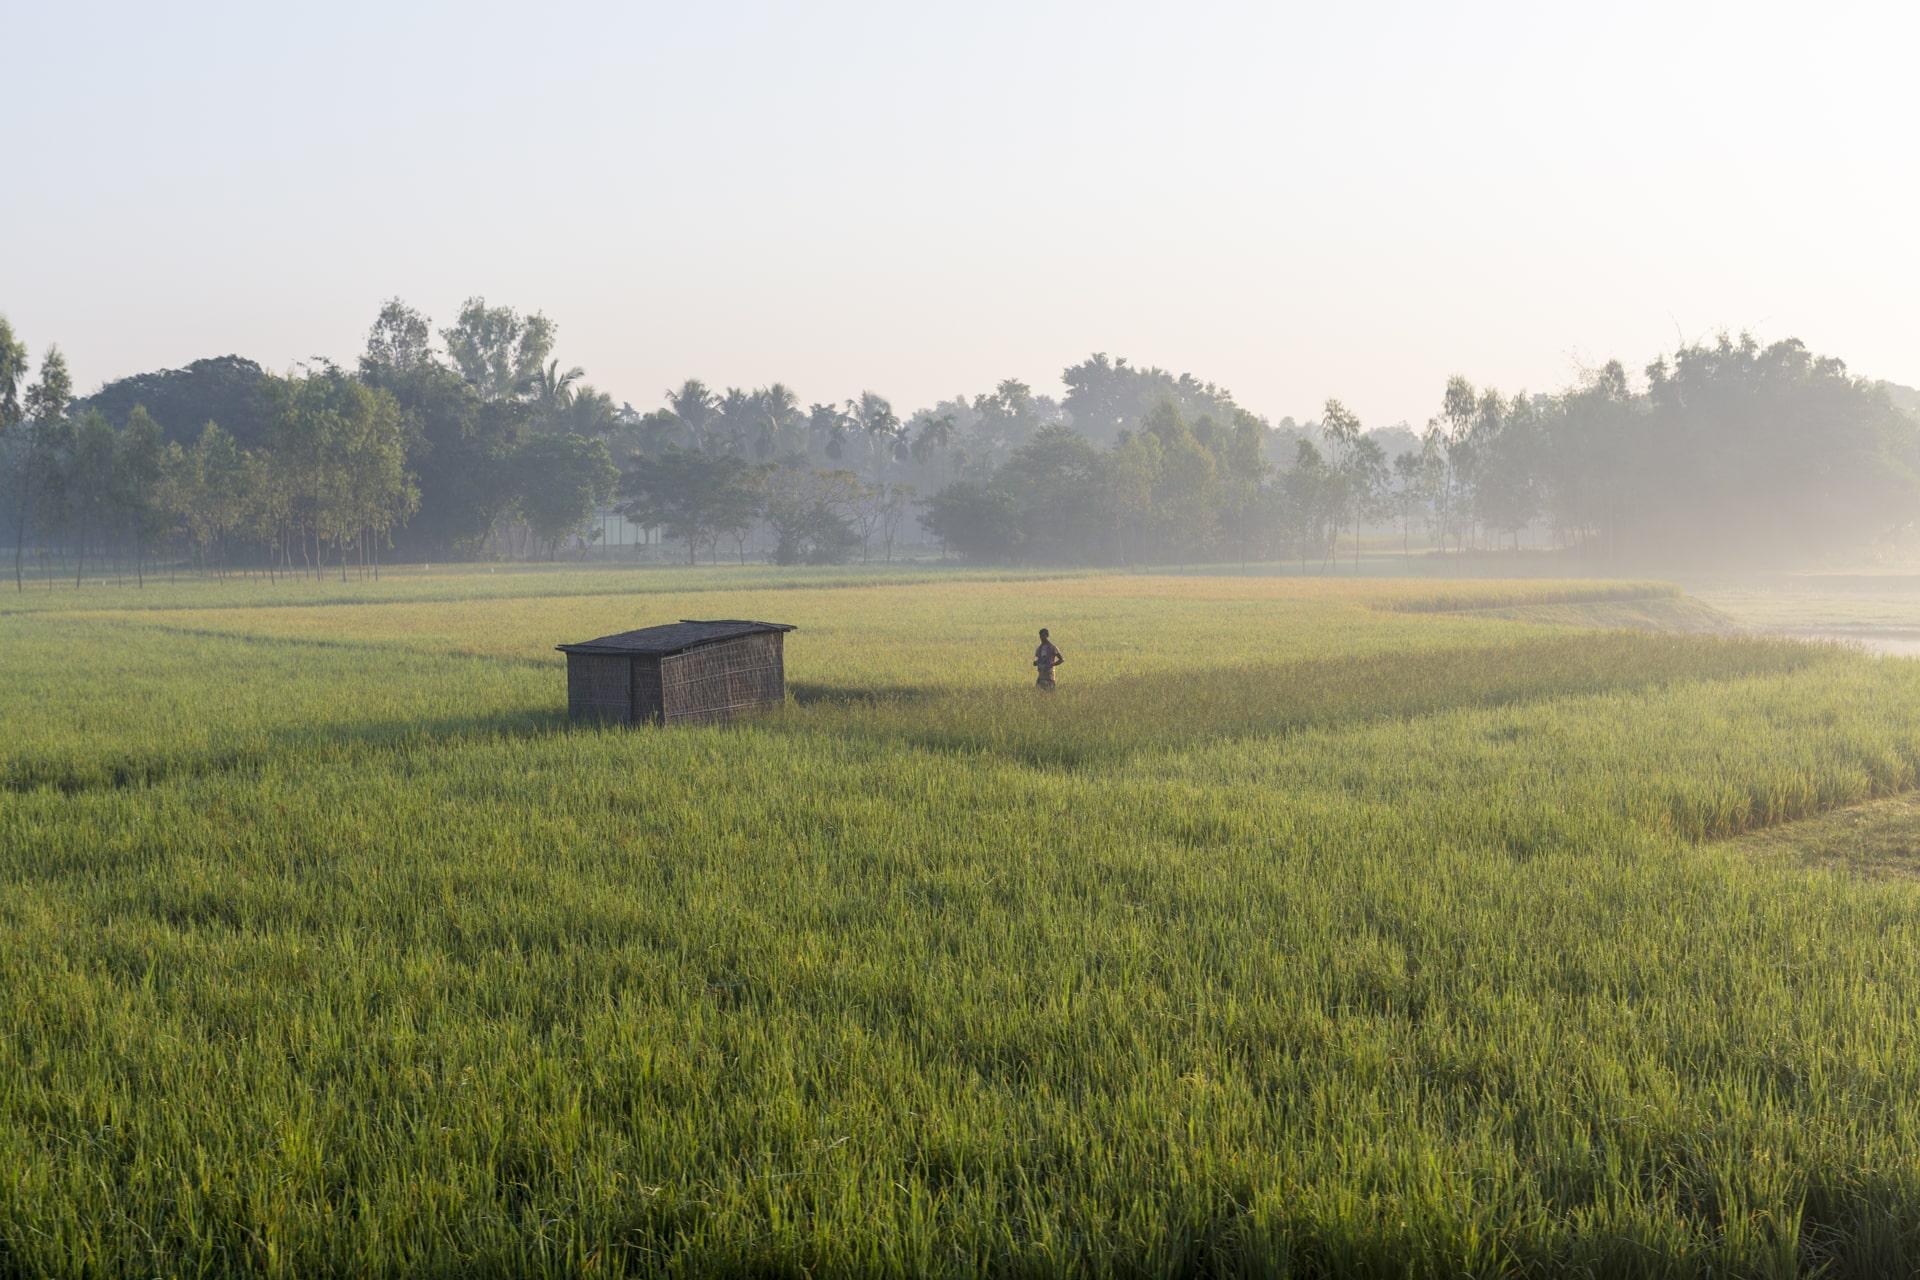 DEWANGONI, BANGLADESH – NOVEMBER 3, 2014